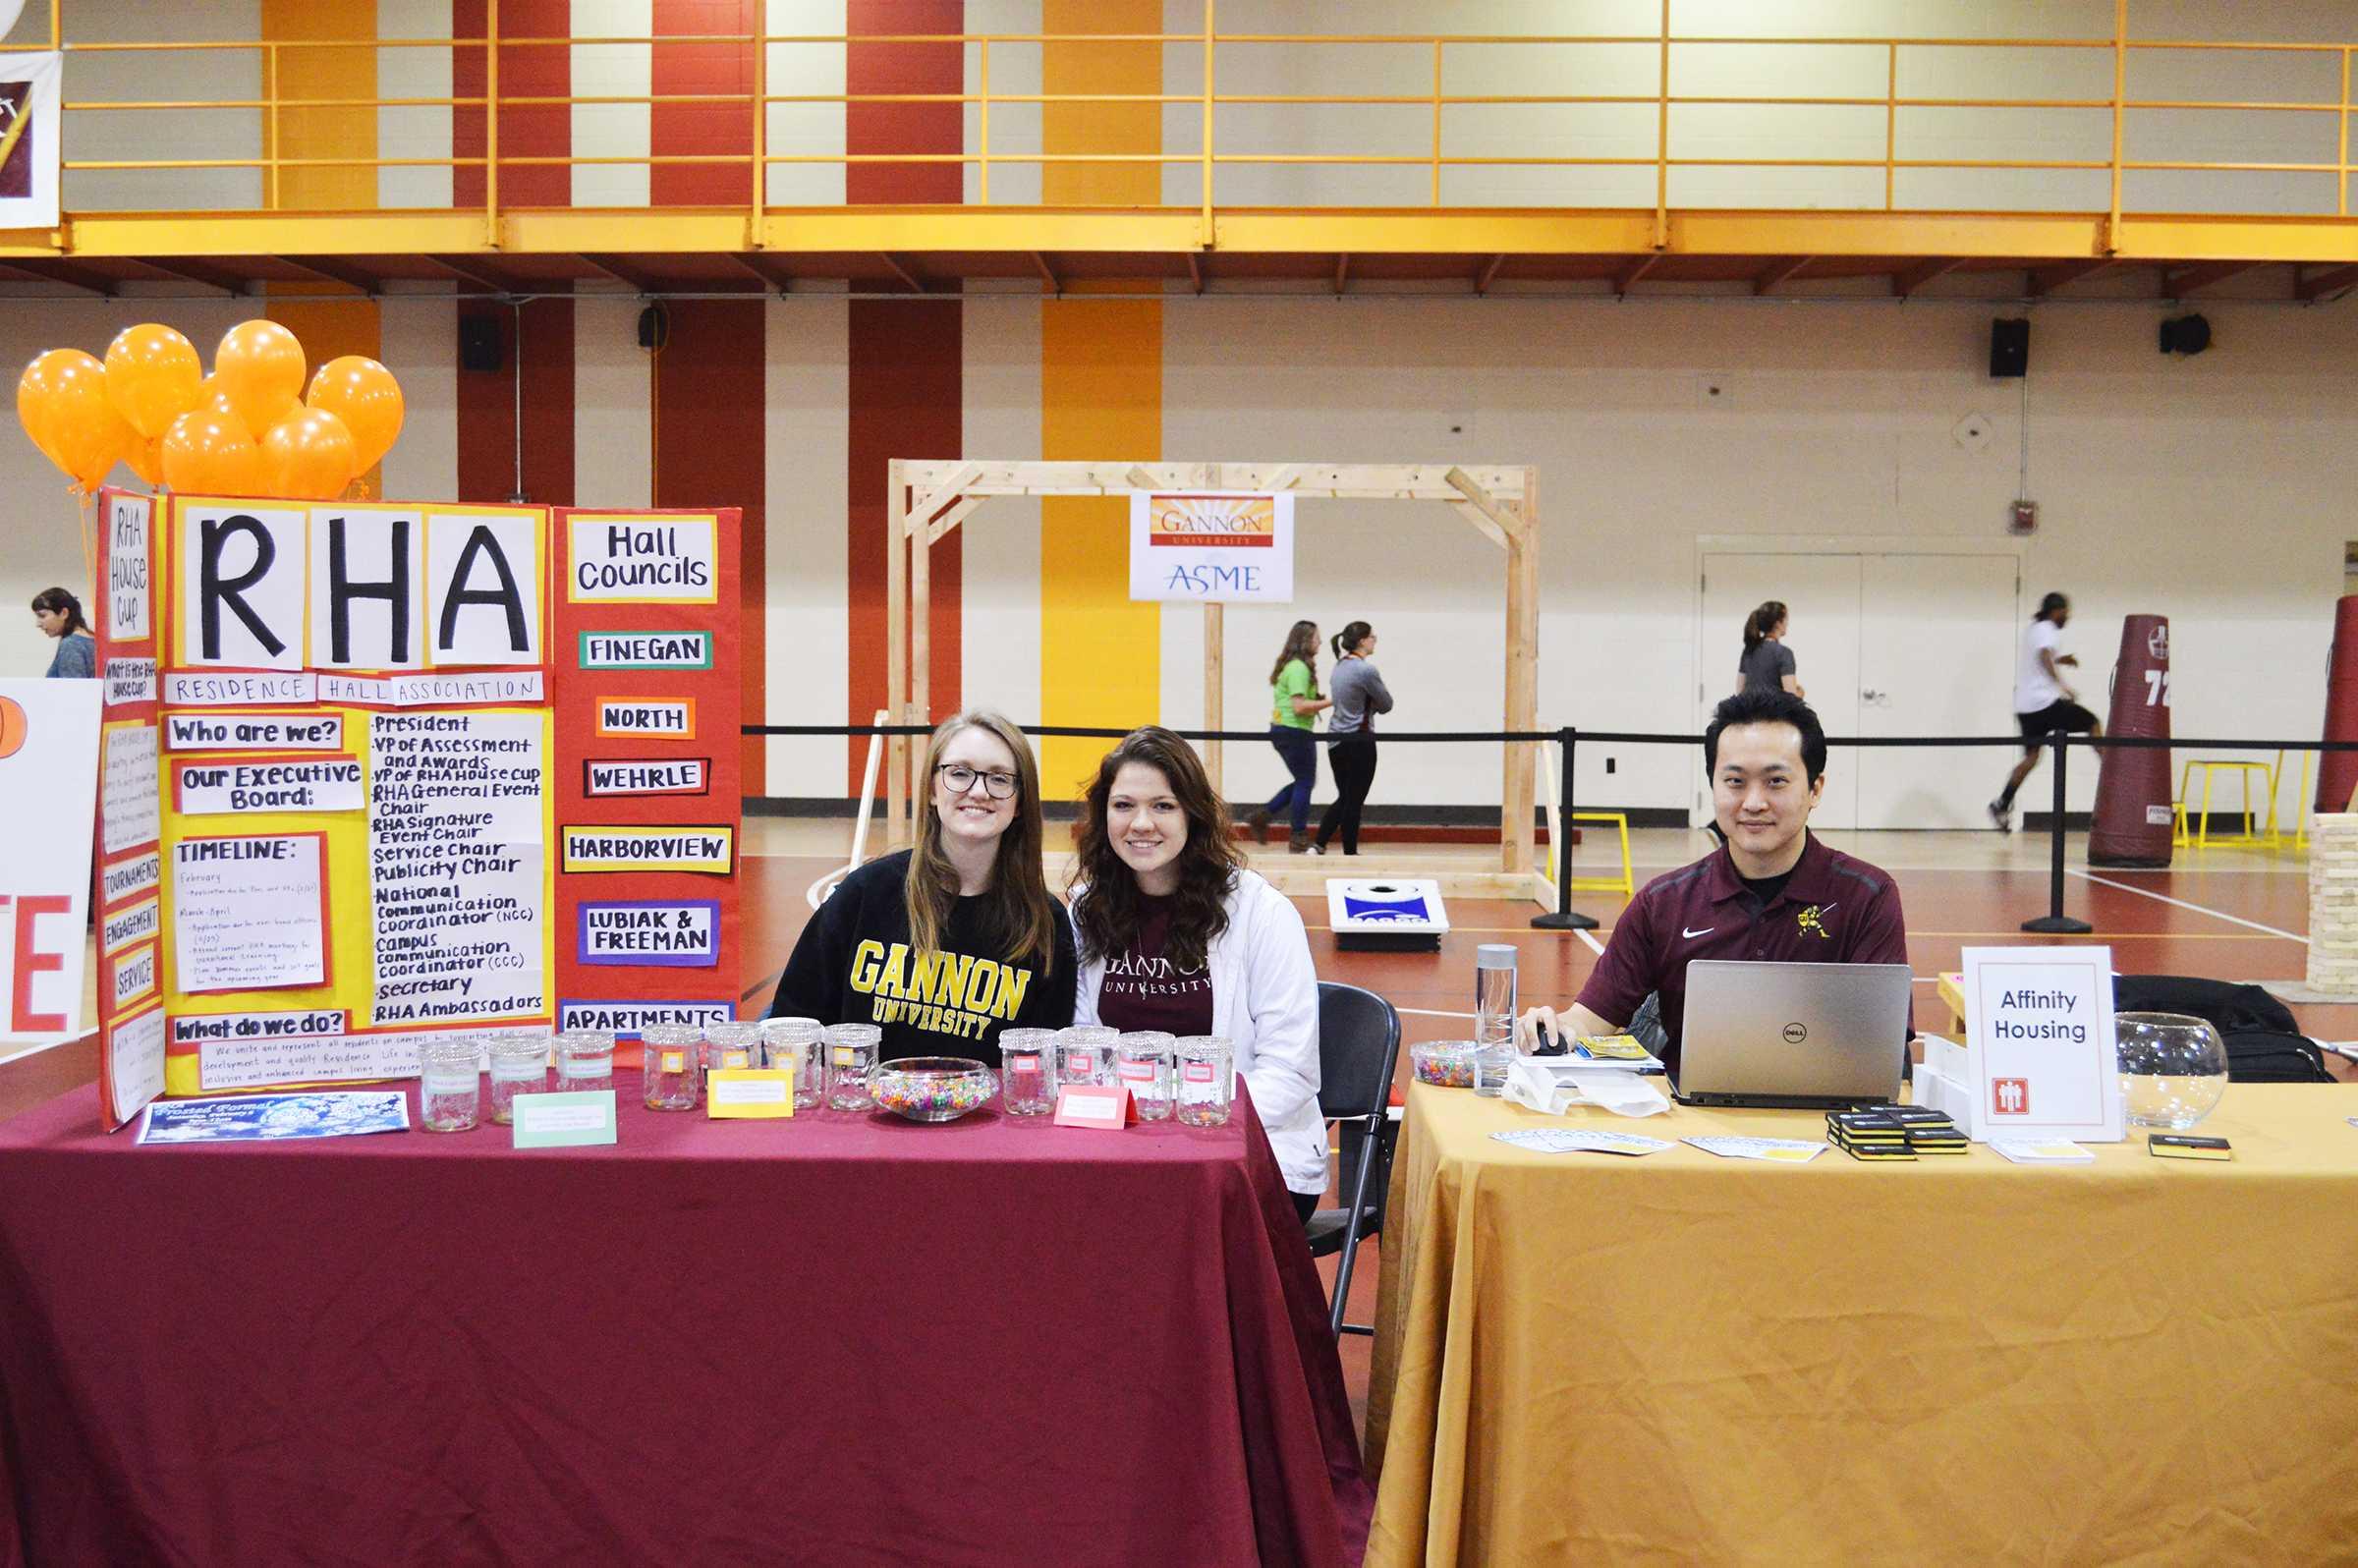 12th annual Wellness Fair held on campus